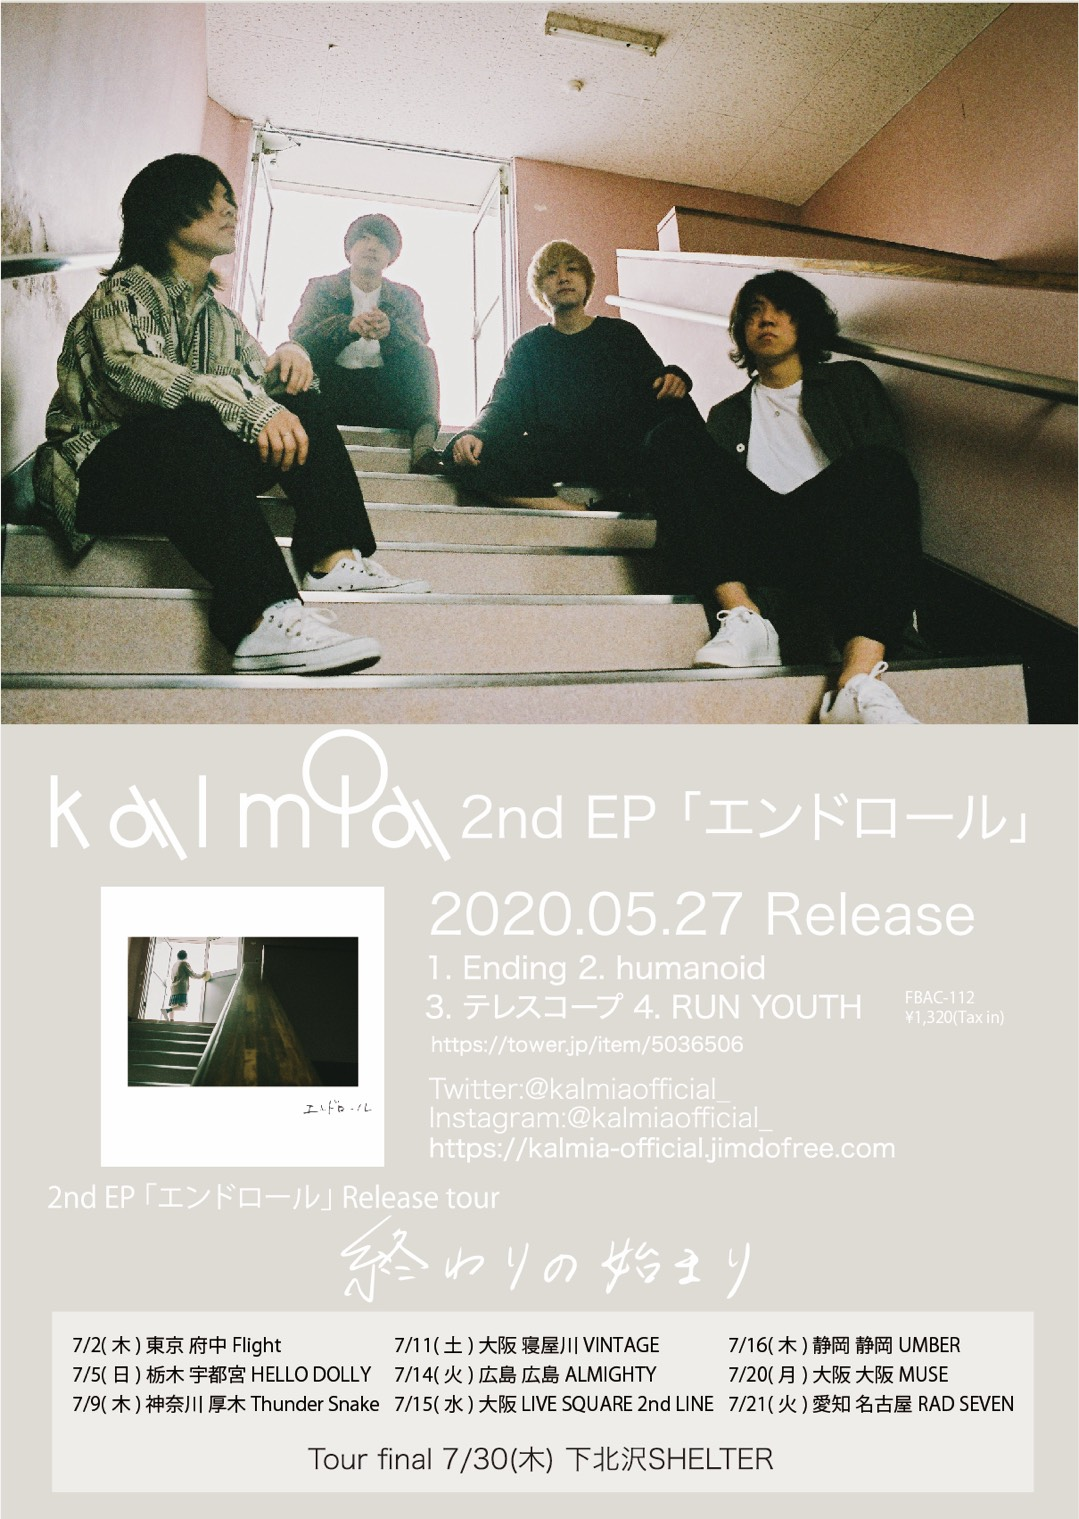 kalmia 2nd EP「エンドロール」Release tour 終わりの始まり